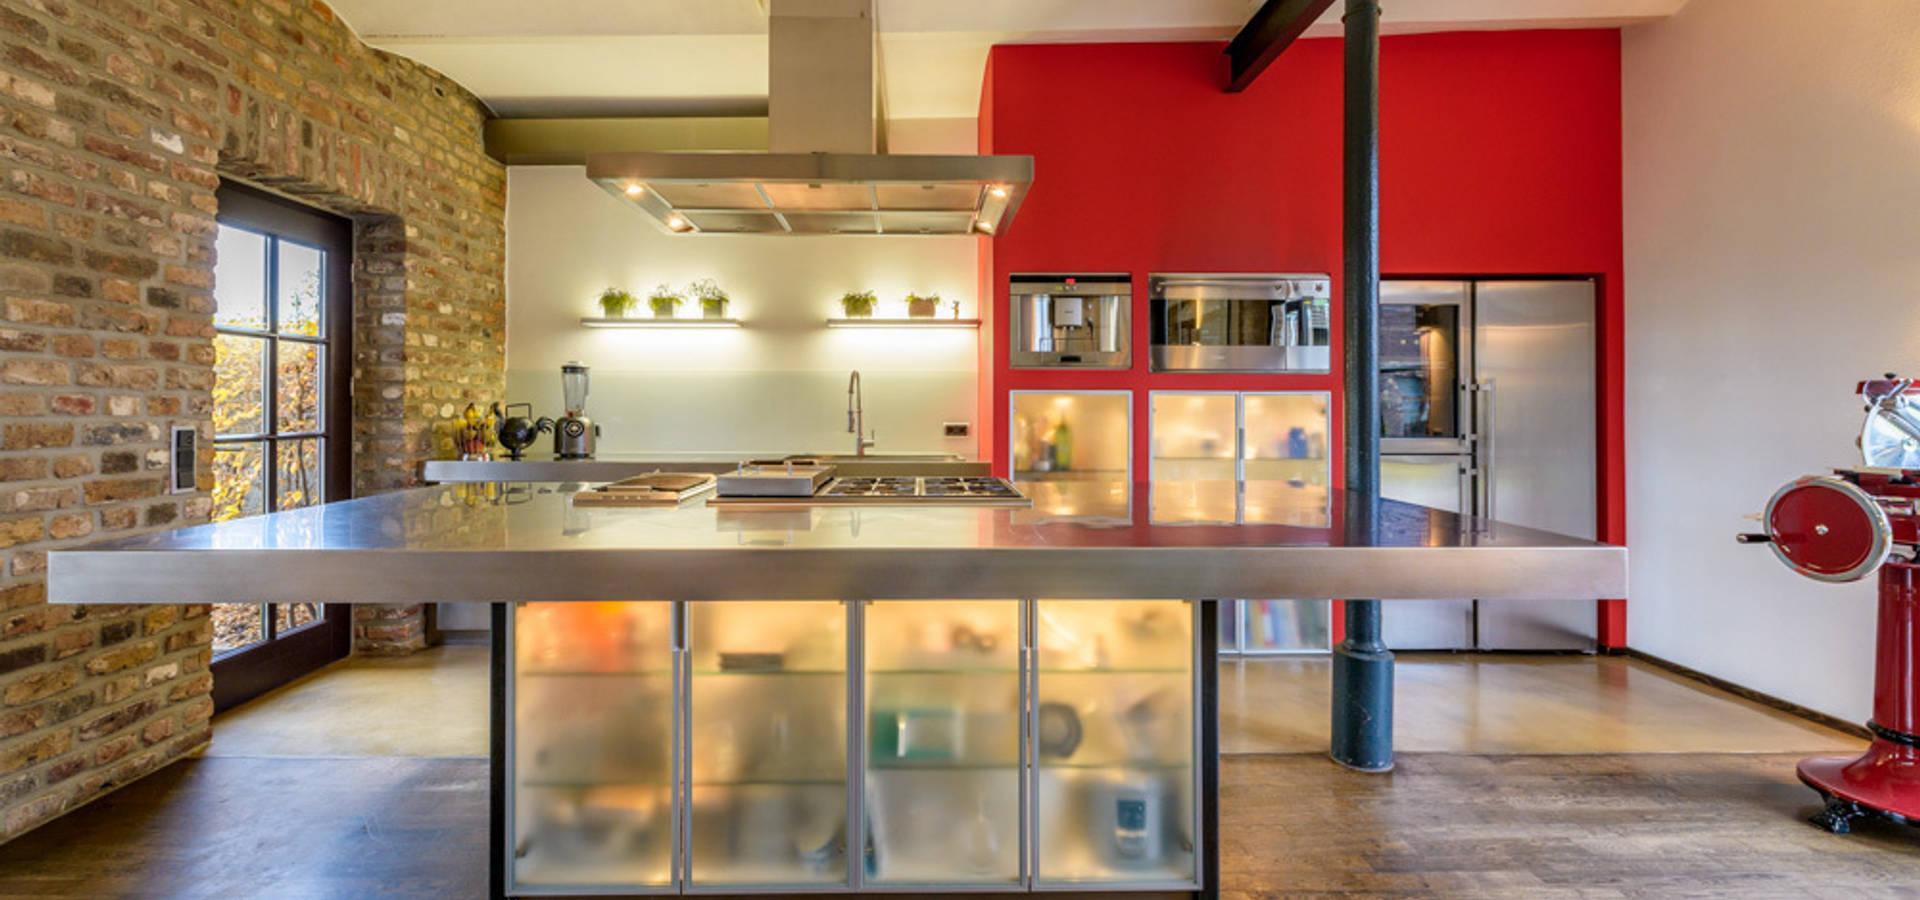 immoshots.de – Fotografie für Architektur, Interieur, Immobilien